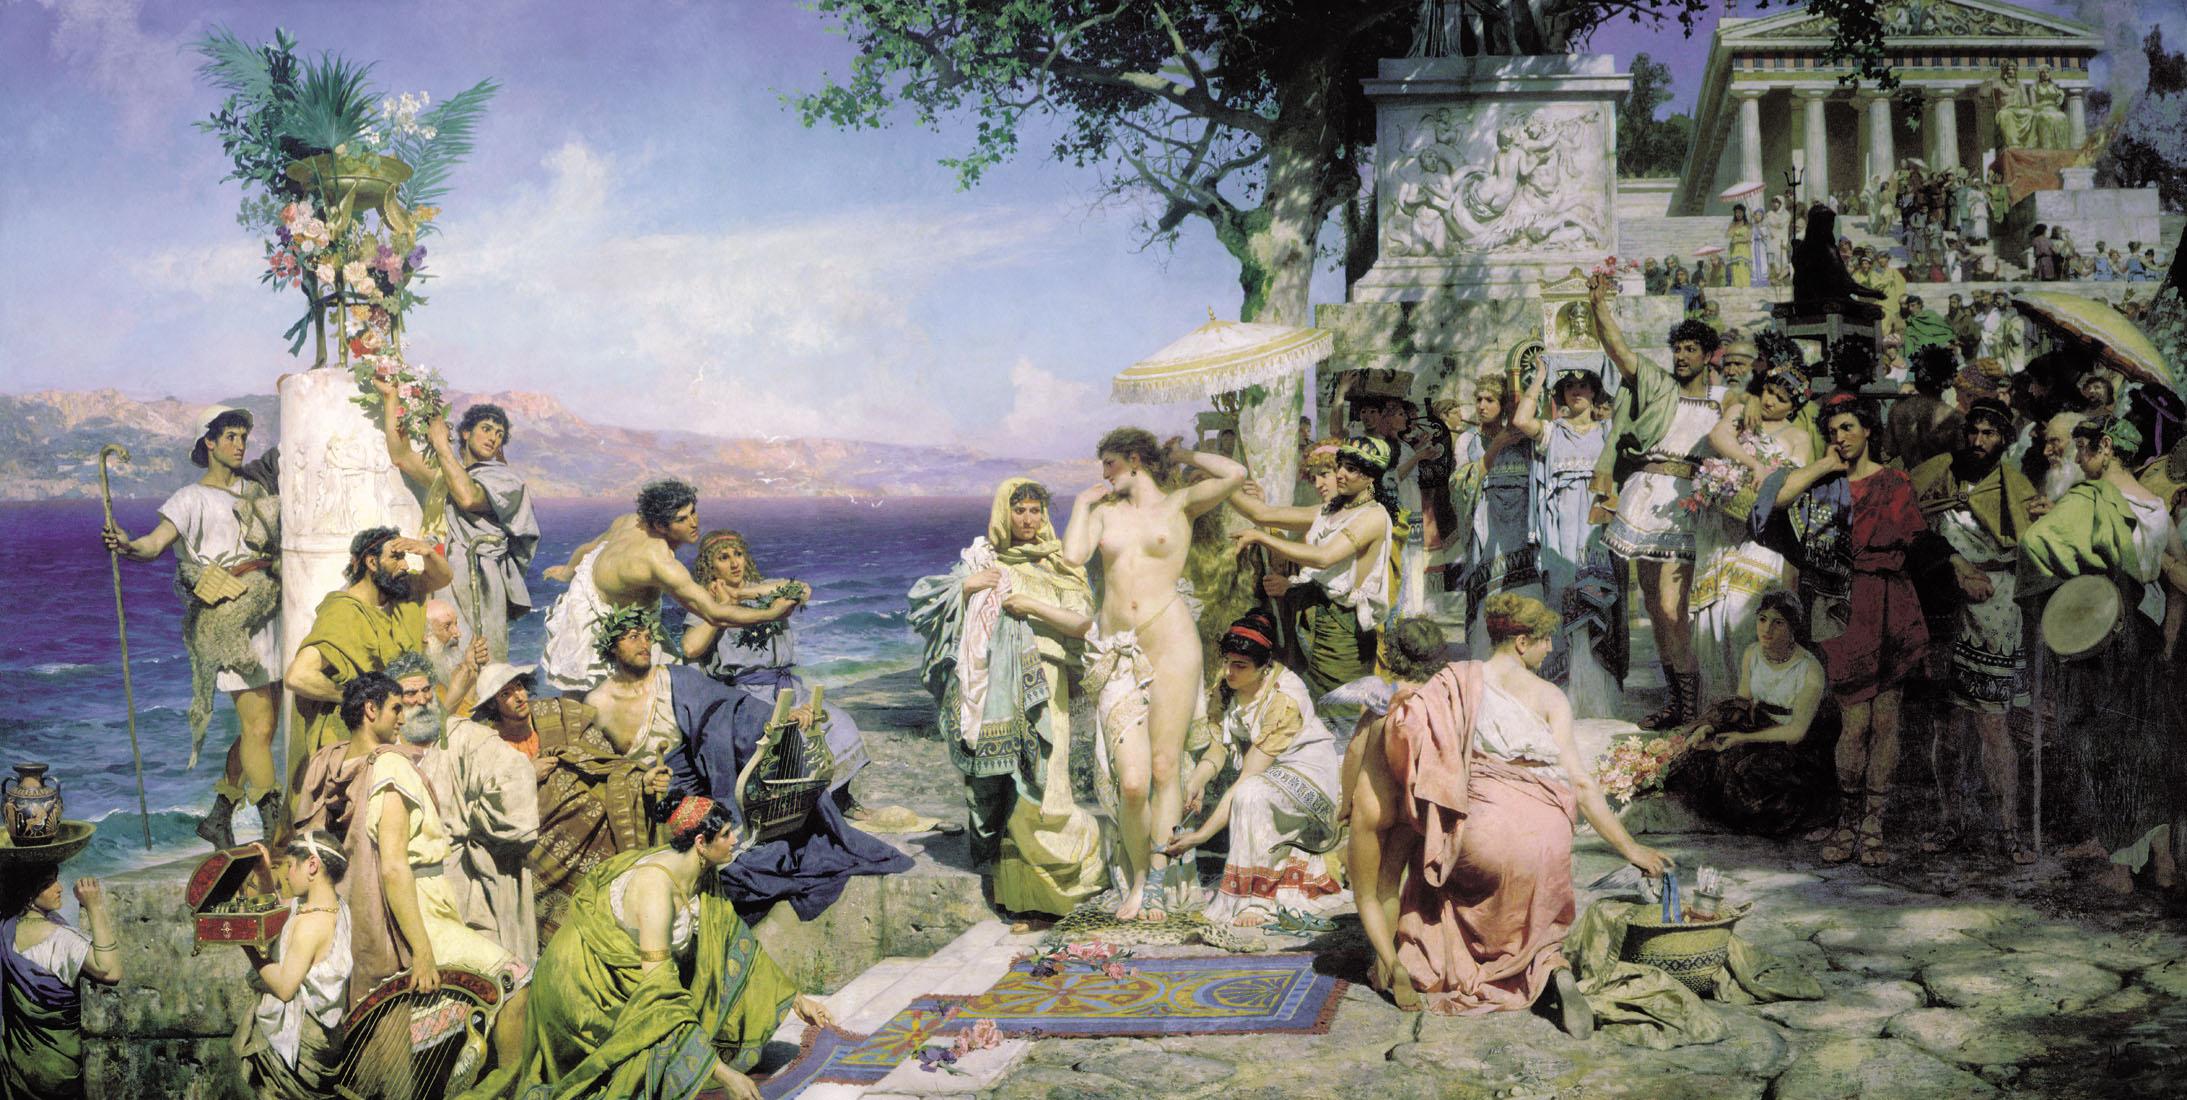 Фрина на празднике Посейдона в Элевсине картина Генриха Семирадского